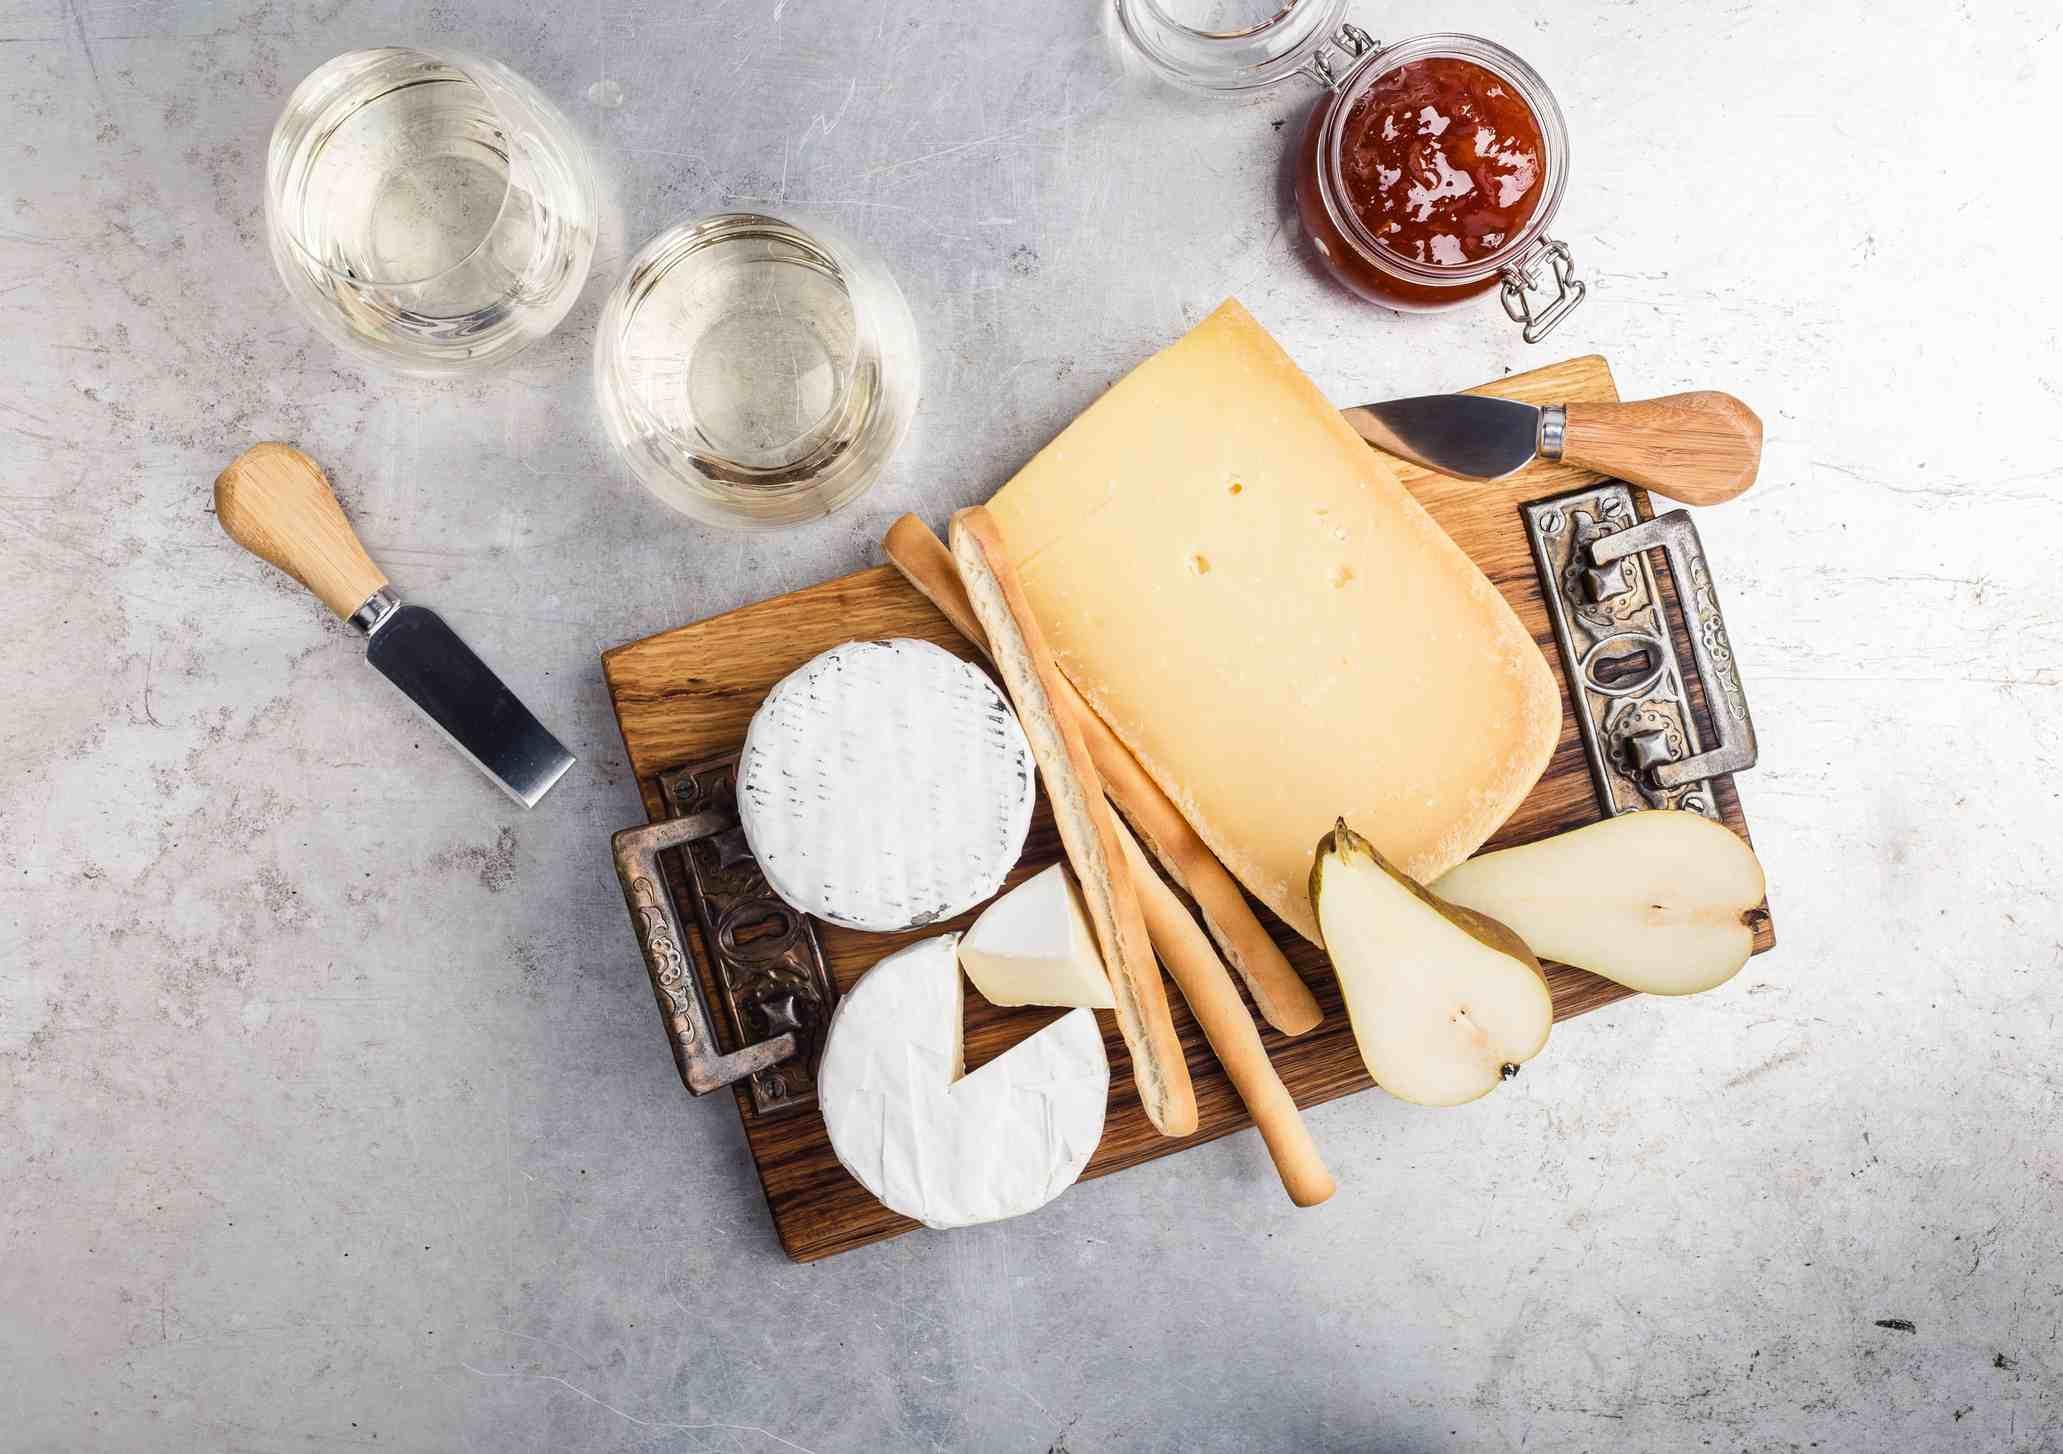 Cheeseboard and wine